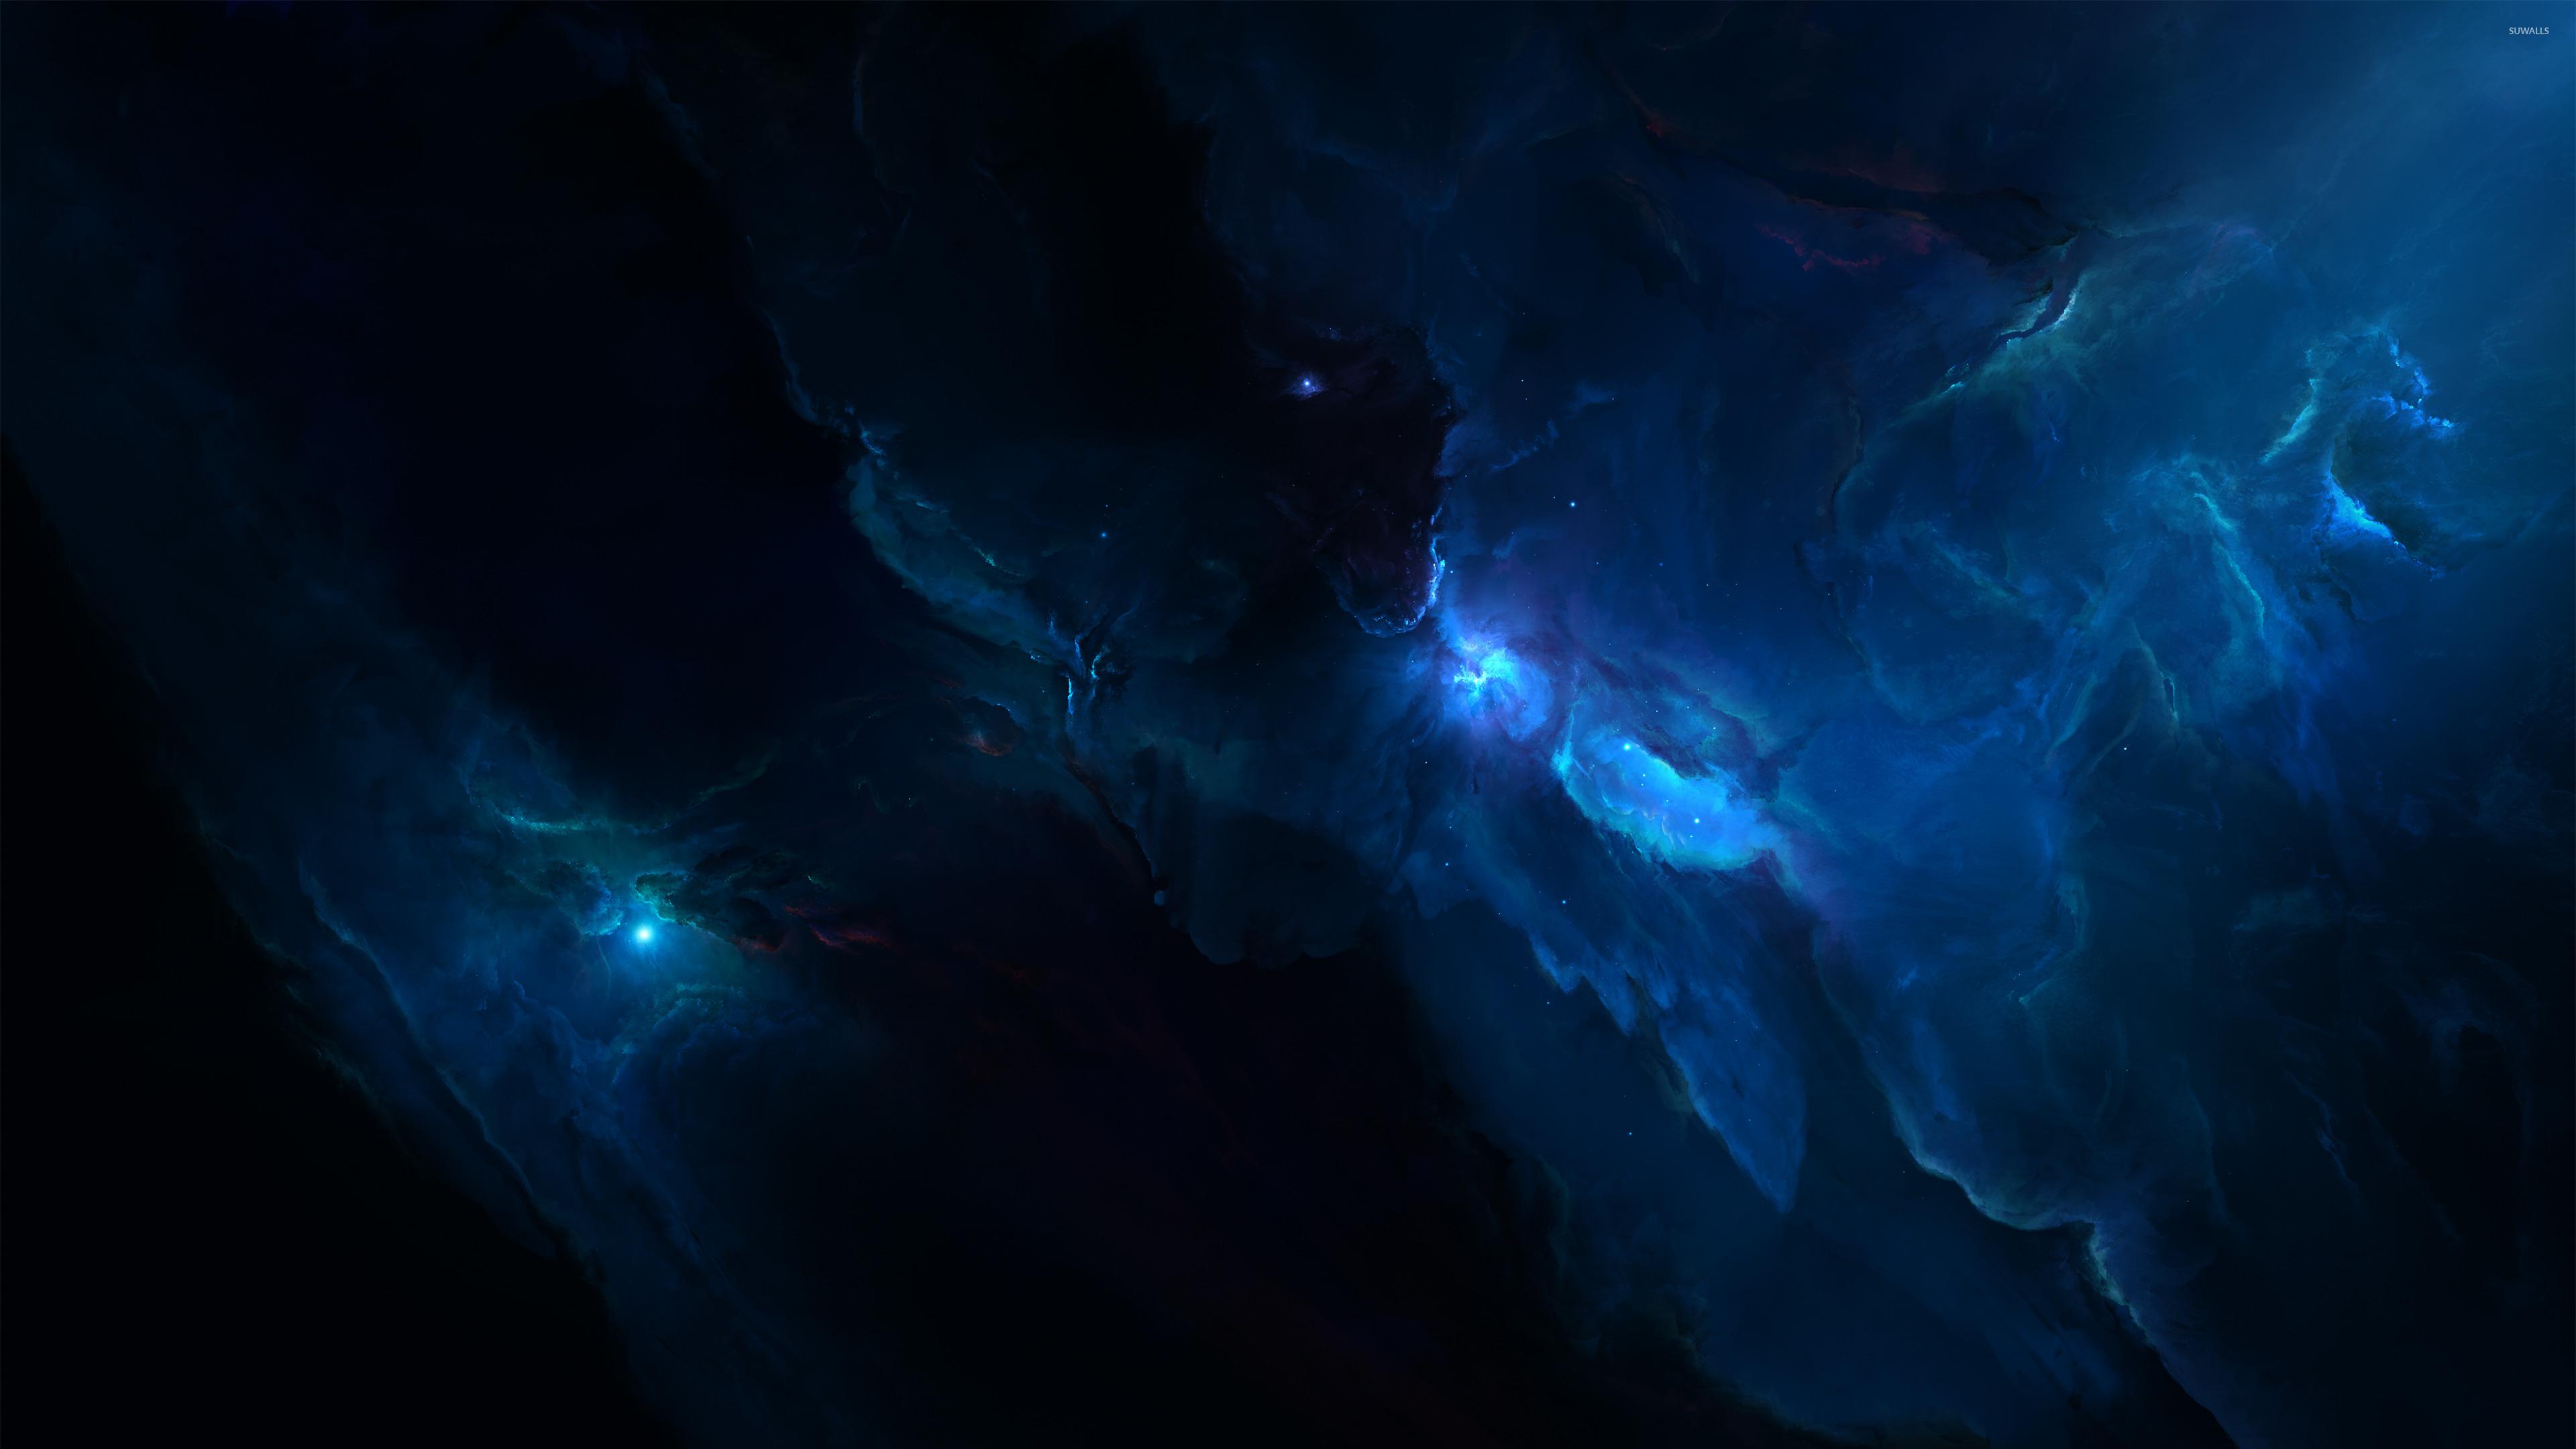 Blue nebula [2] wallpaper - Space wallpapers - #37911